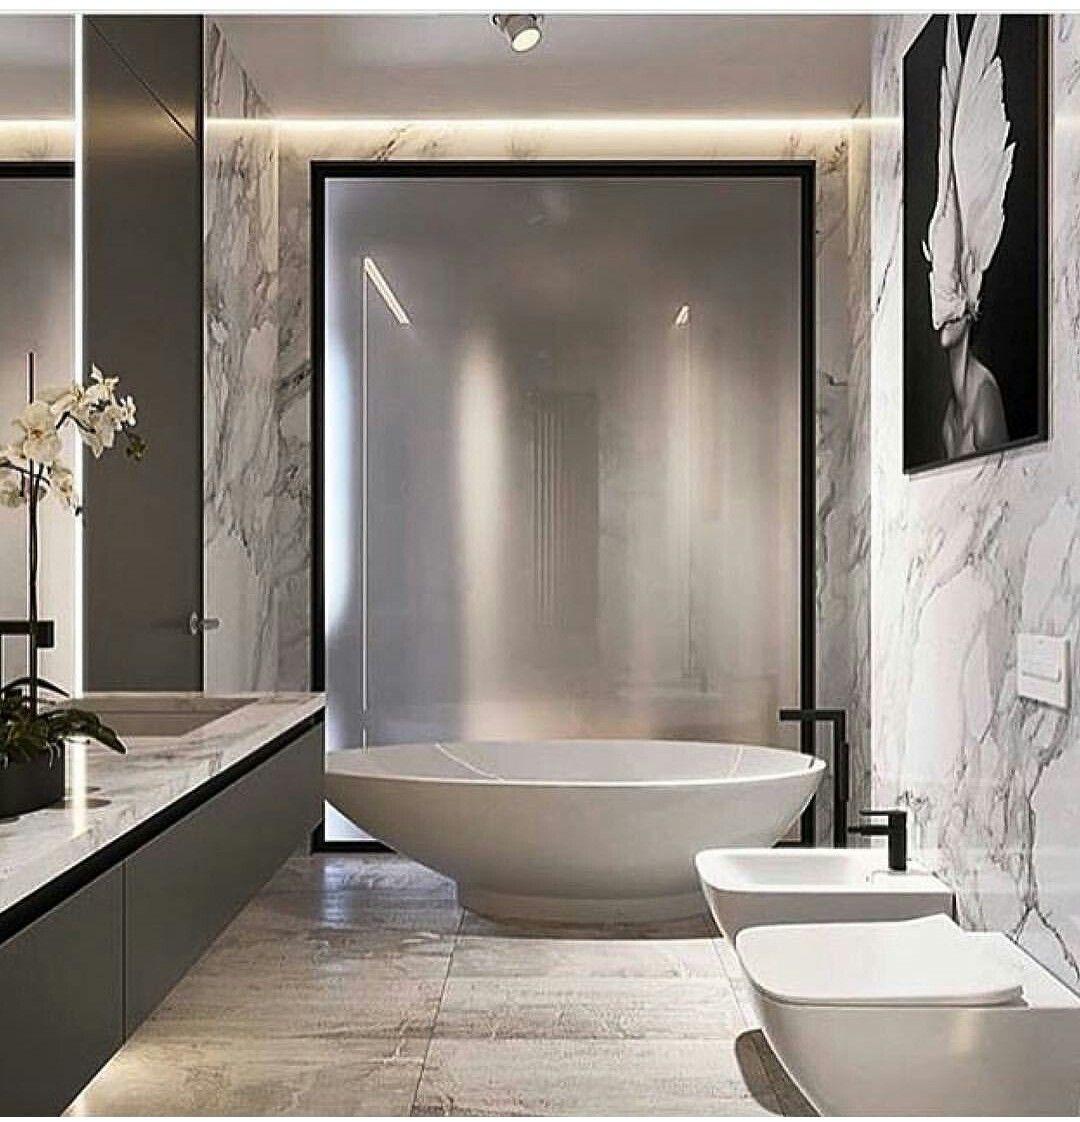 Pinterest Javi Kassens Luxusbad Moderne Toilette Luxus Badezimmer